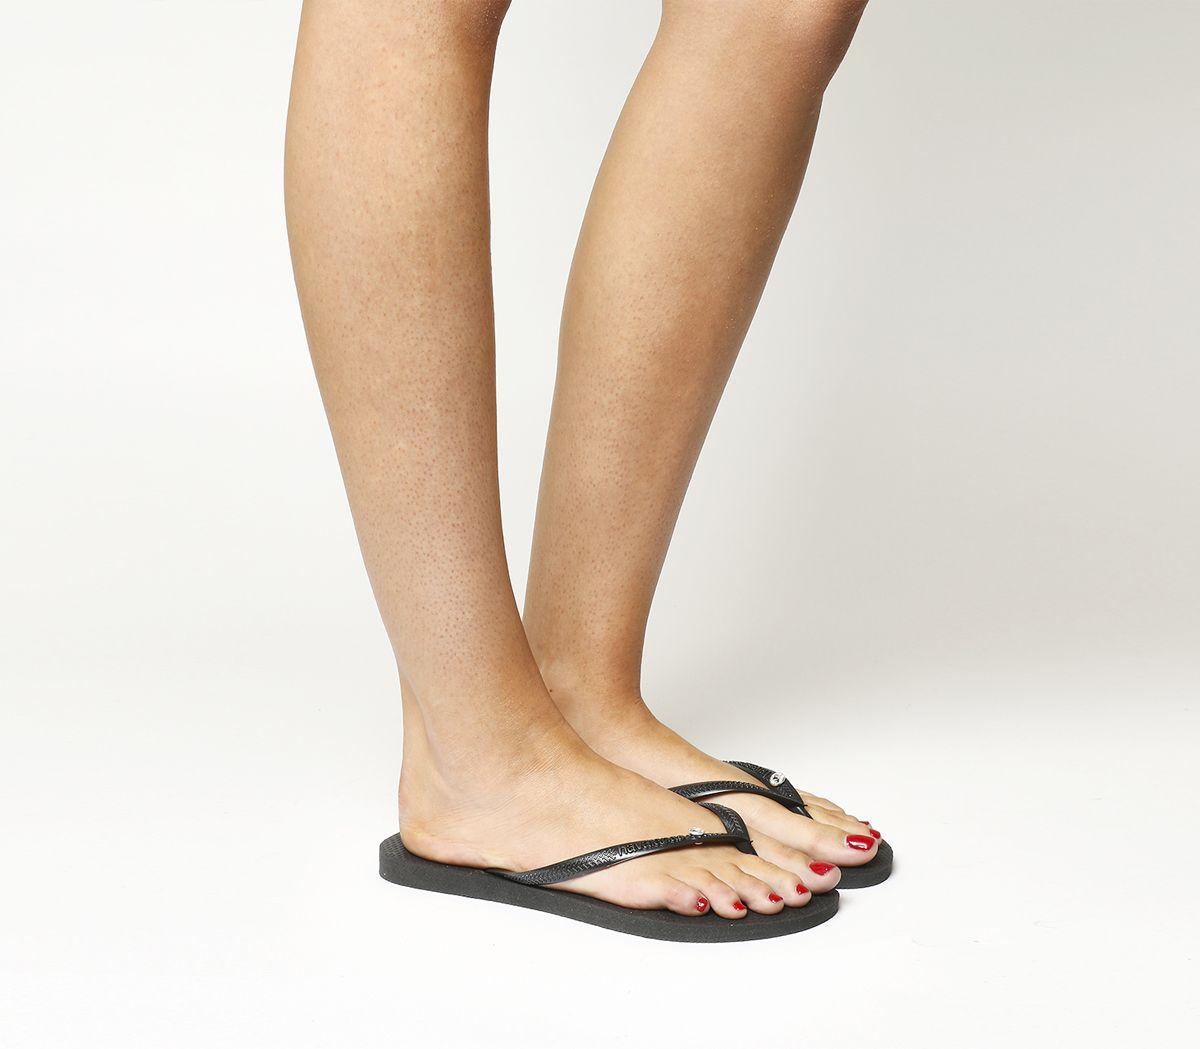 4d7236fe0 Havaianas Slim Crystal Glamour Black Rubber - Sandals